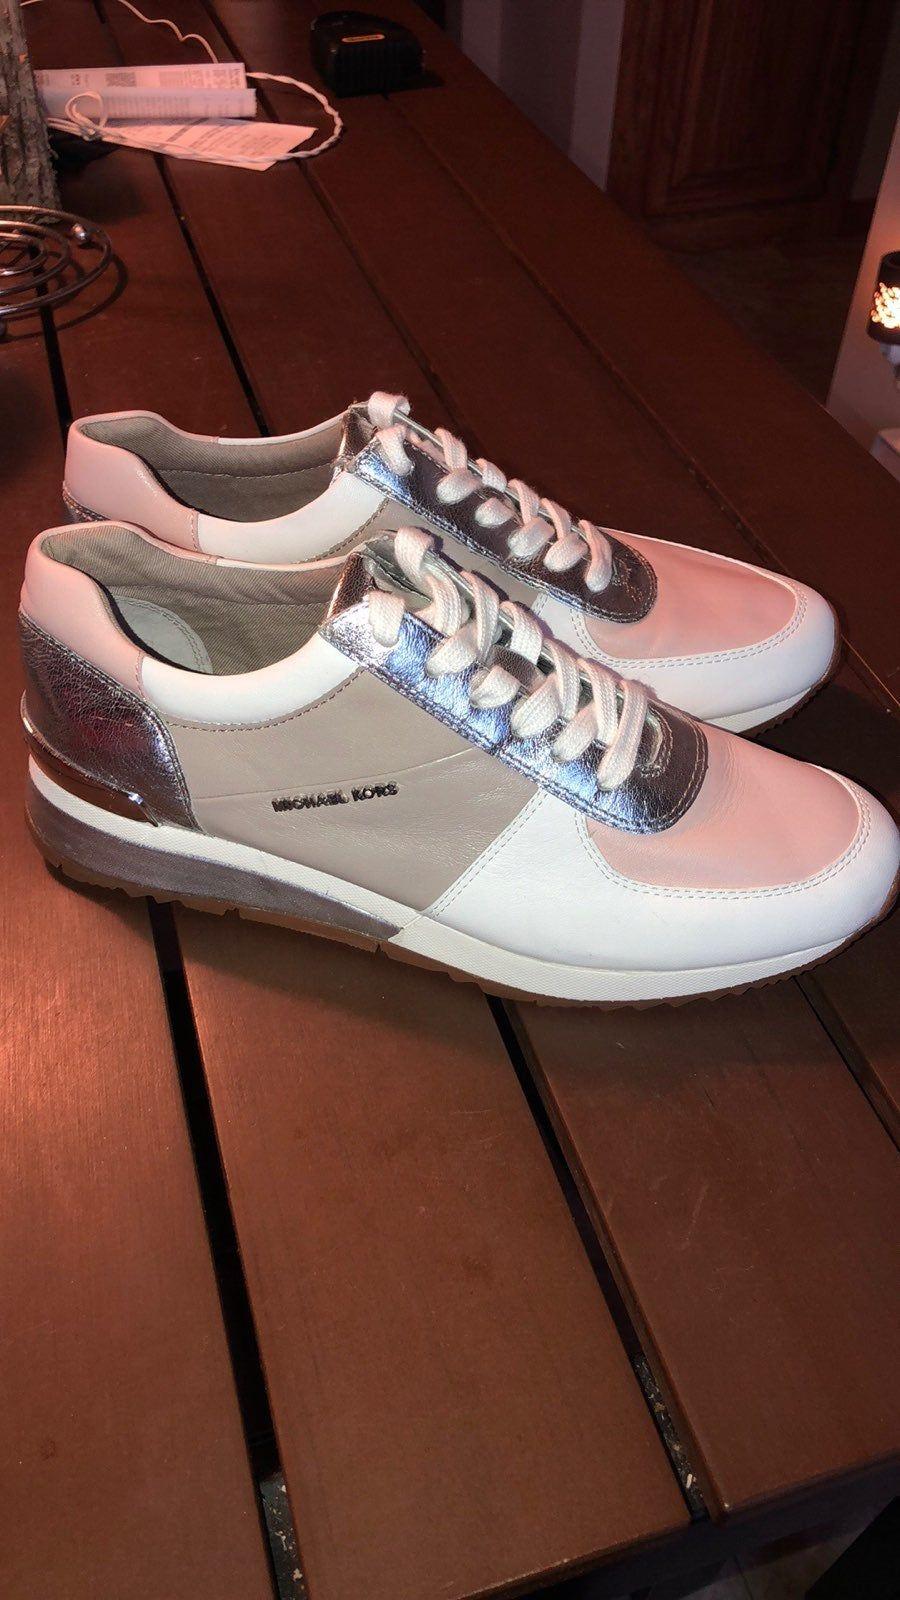 michael kors tennis shoes pink